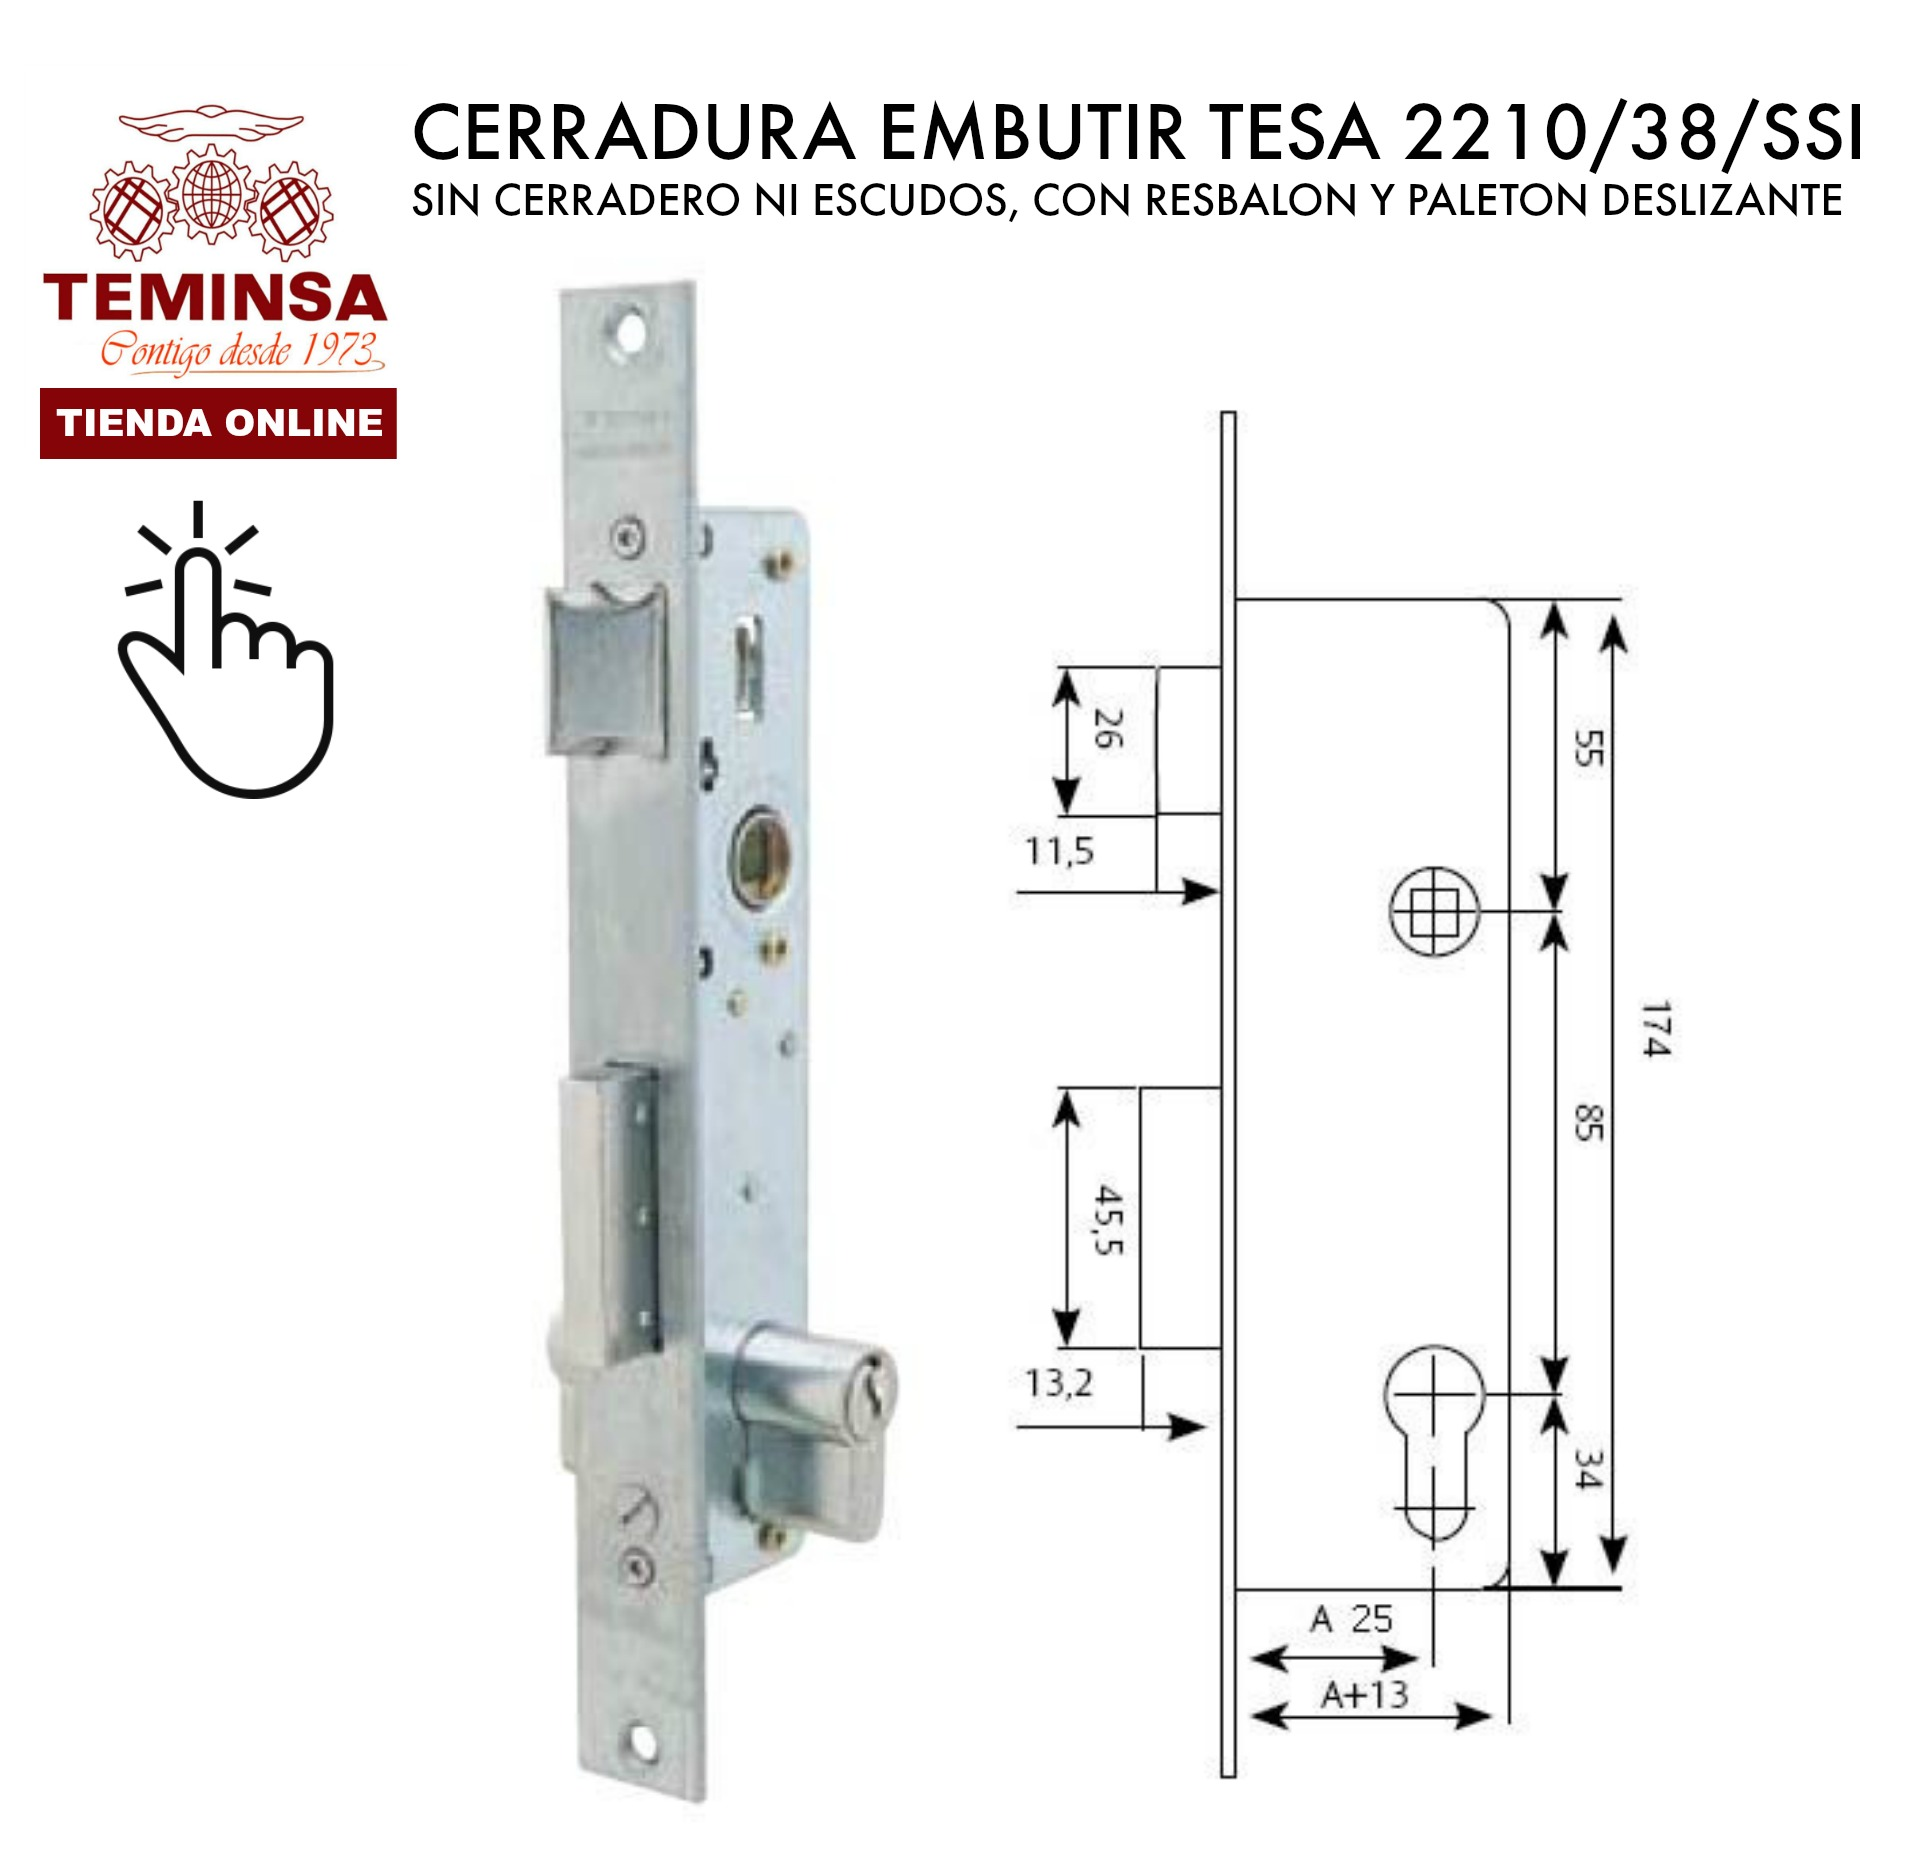 CERRADURA EMBUTIR TESA 221038SSI SIN CERRADERO NI ESCUDOS, CON RESBALON Y PALETON DESLIZANTE TEMINSA ONLINE